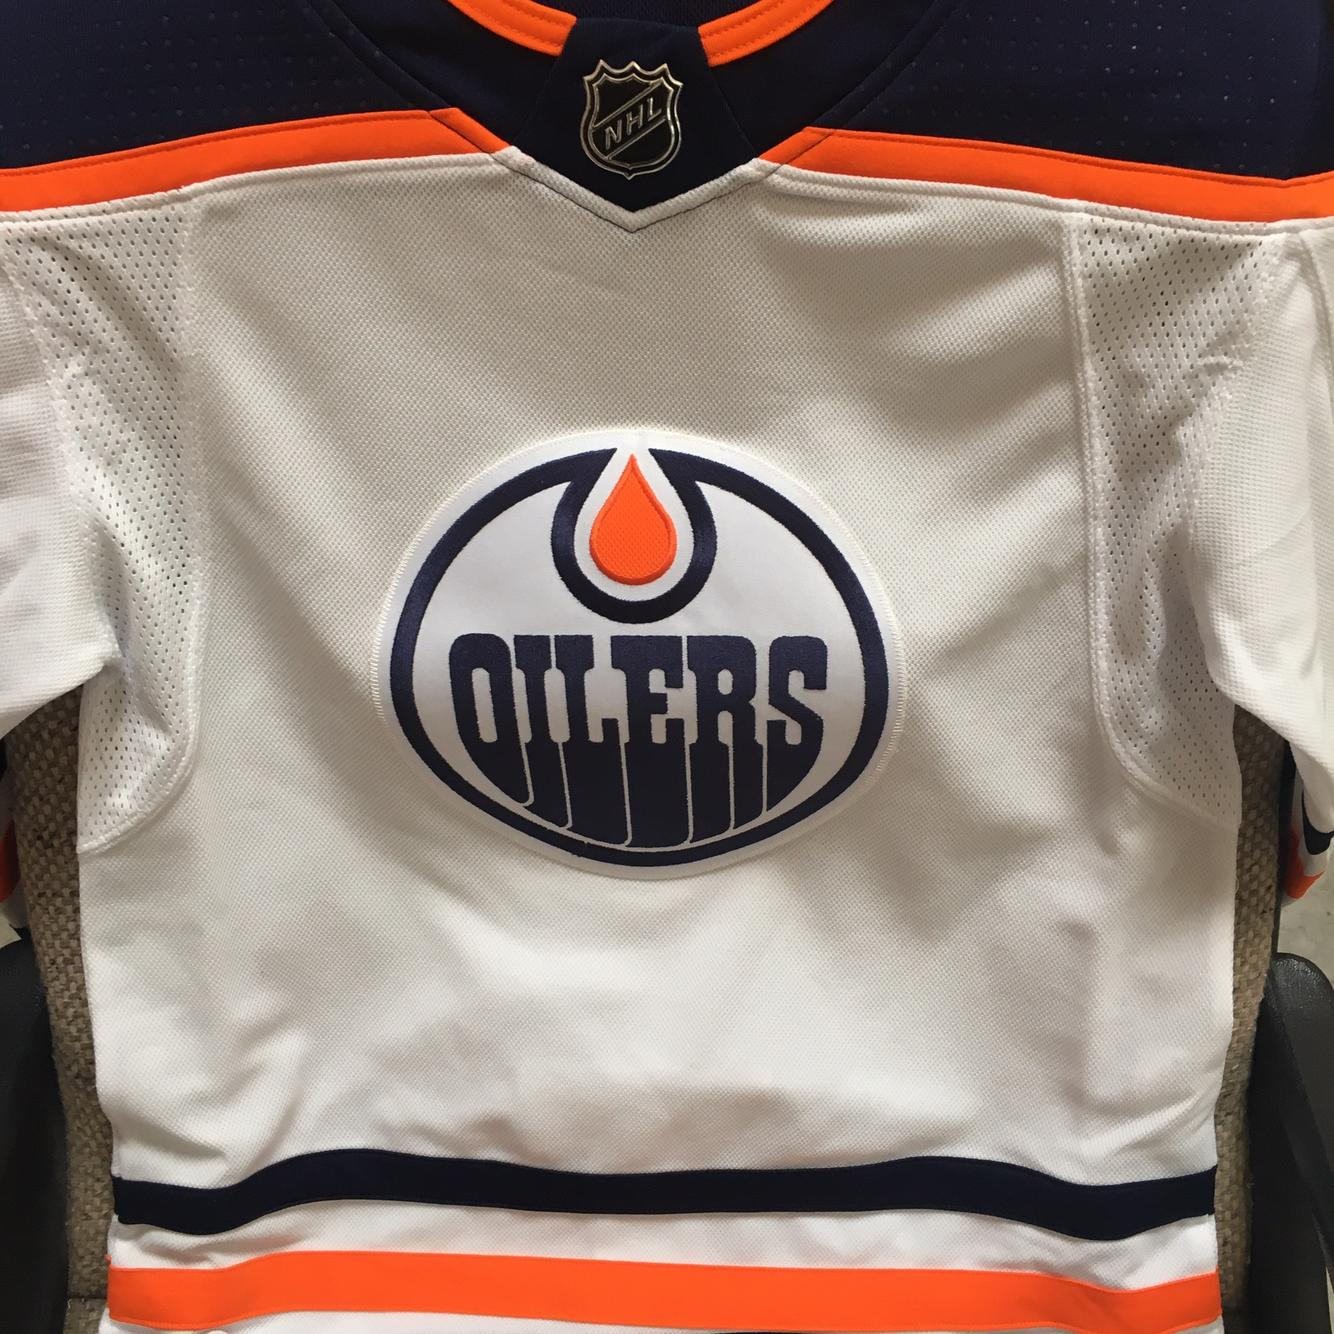 Adidas Edmonton Oilers White Adult Size 44 (XS) Jersey   Hockey ...